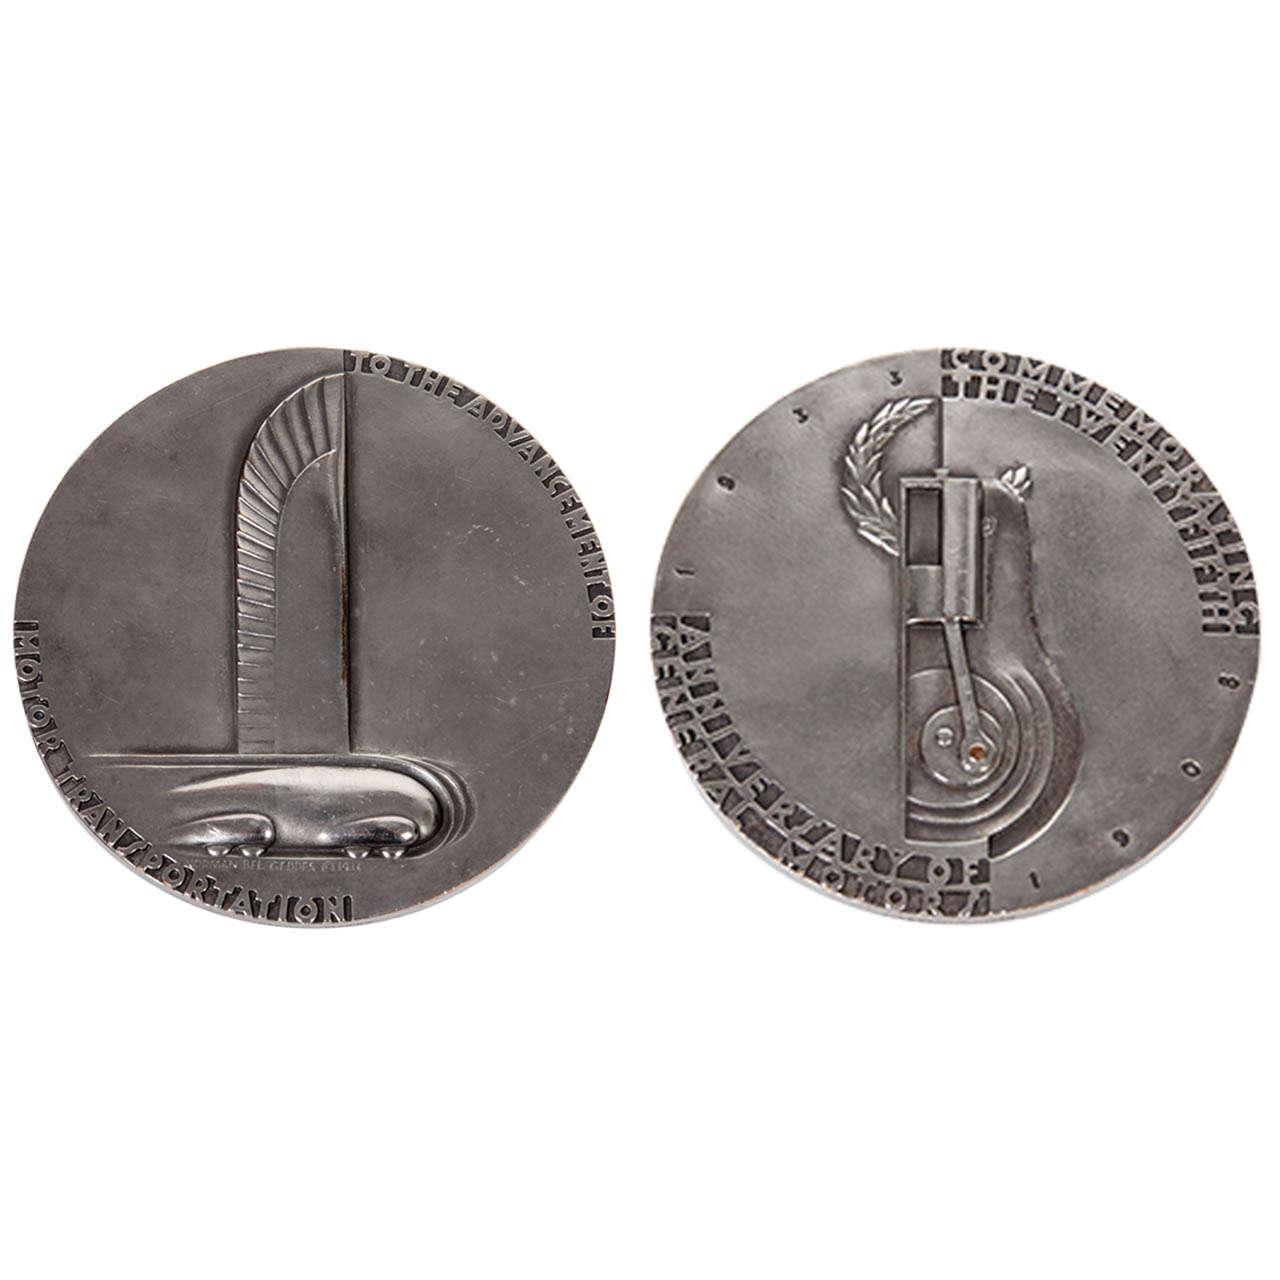 Norman Bel Geddes Art Deco Streamline Medal 25th anniversary of GM ...